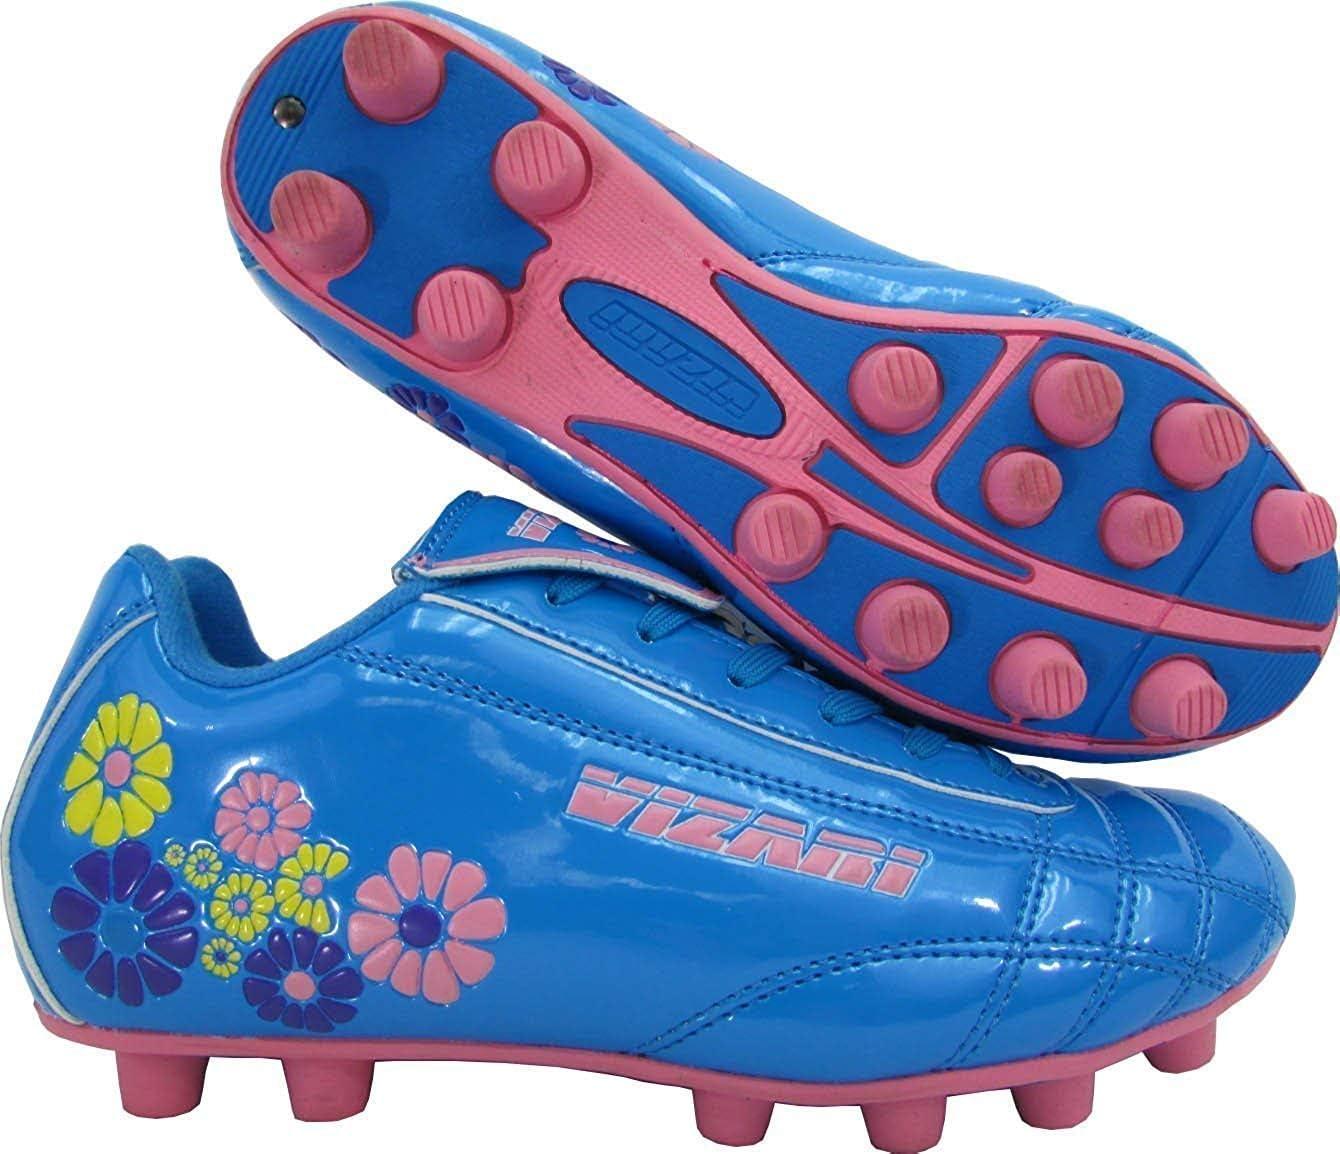 Vizari Blossom FG Soccer Shoe (Toddler/Little Kid),Blue/Pink,9 US Toddler